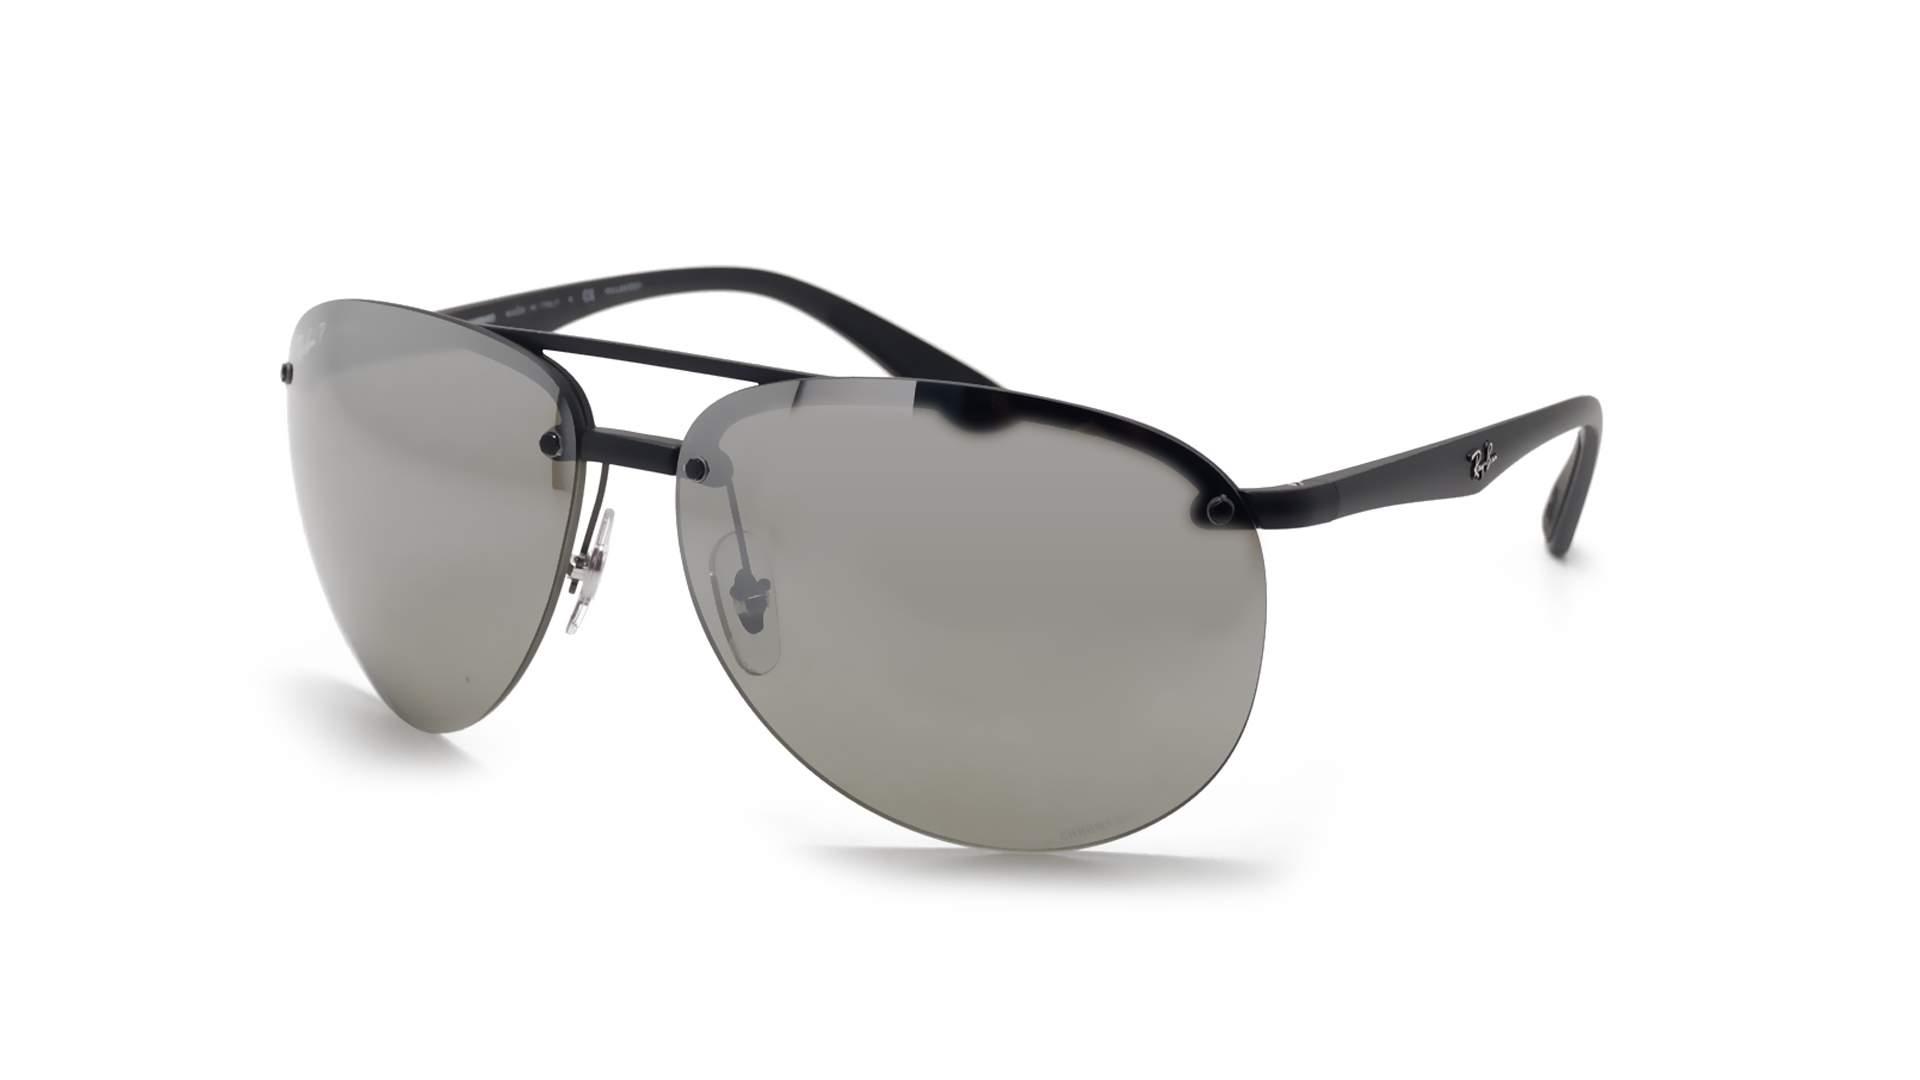 e918b0f8e9e Sunglasses Ray-Ban RB4293CH 601S 5J 65-13 Black Matte Chromance Large Polarized  Mirror